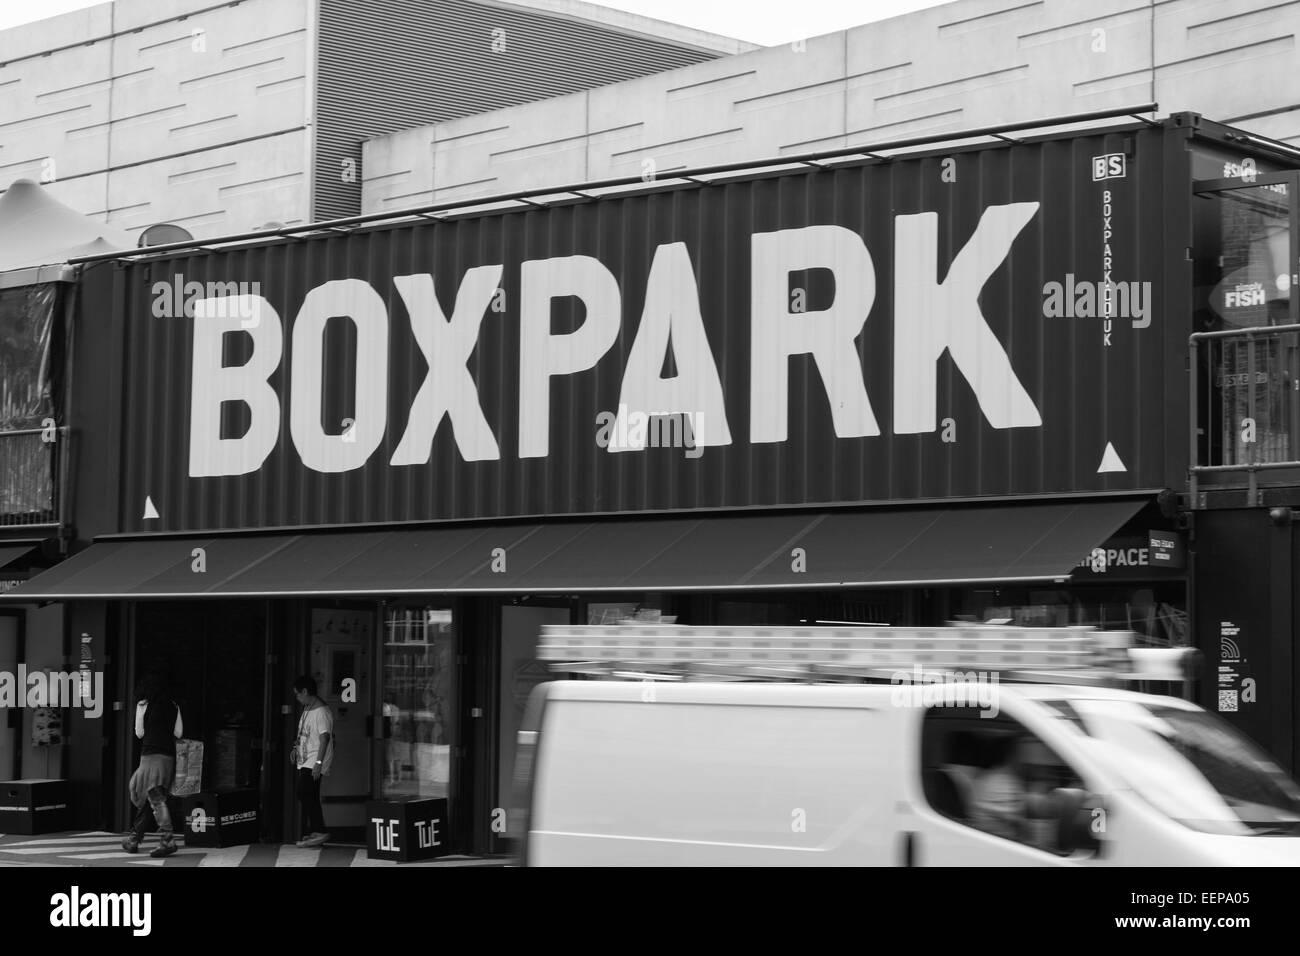 Boxpark, Shoreditch, London - Stock Image